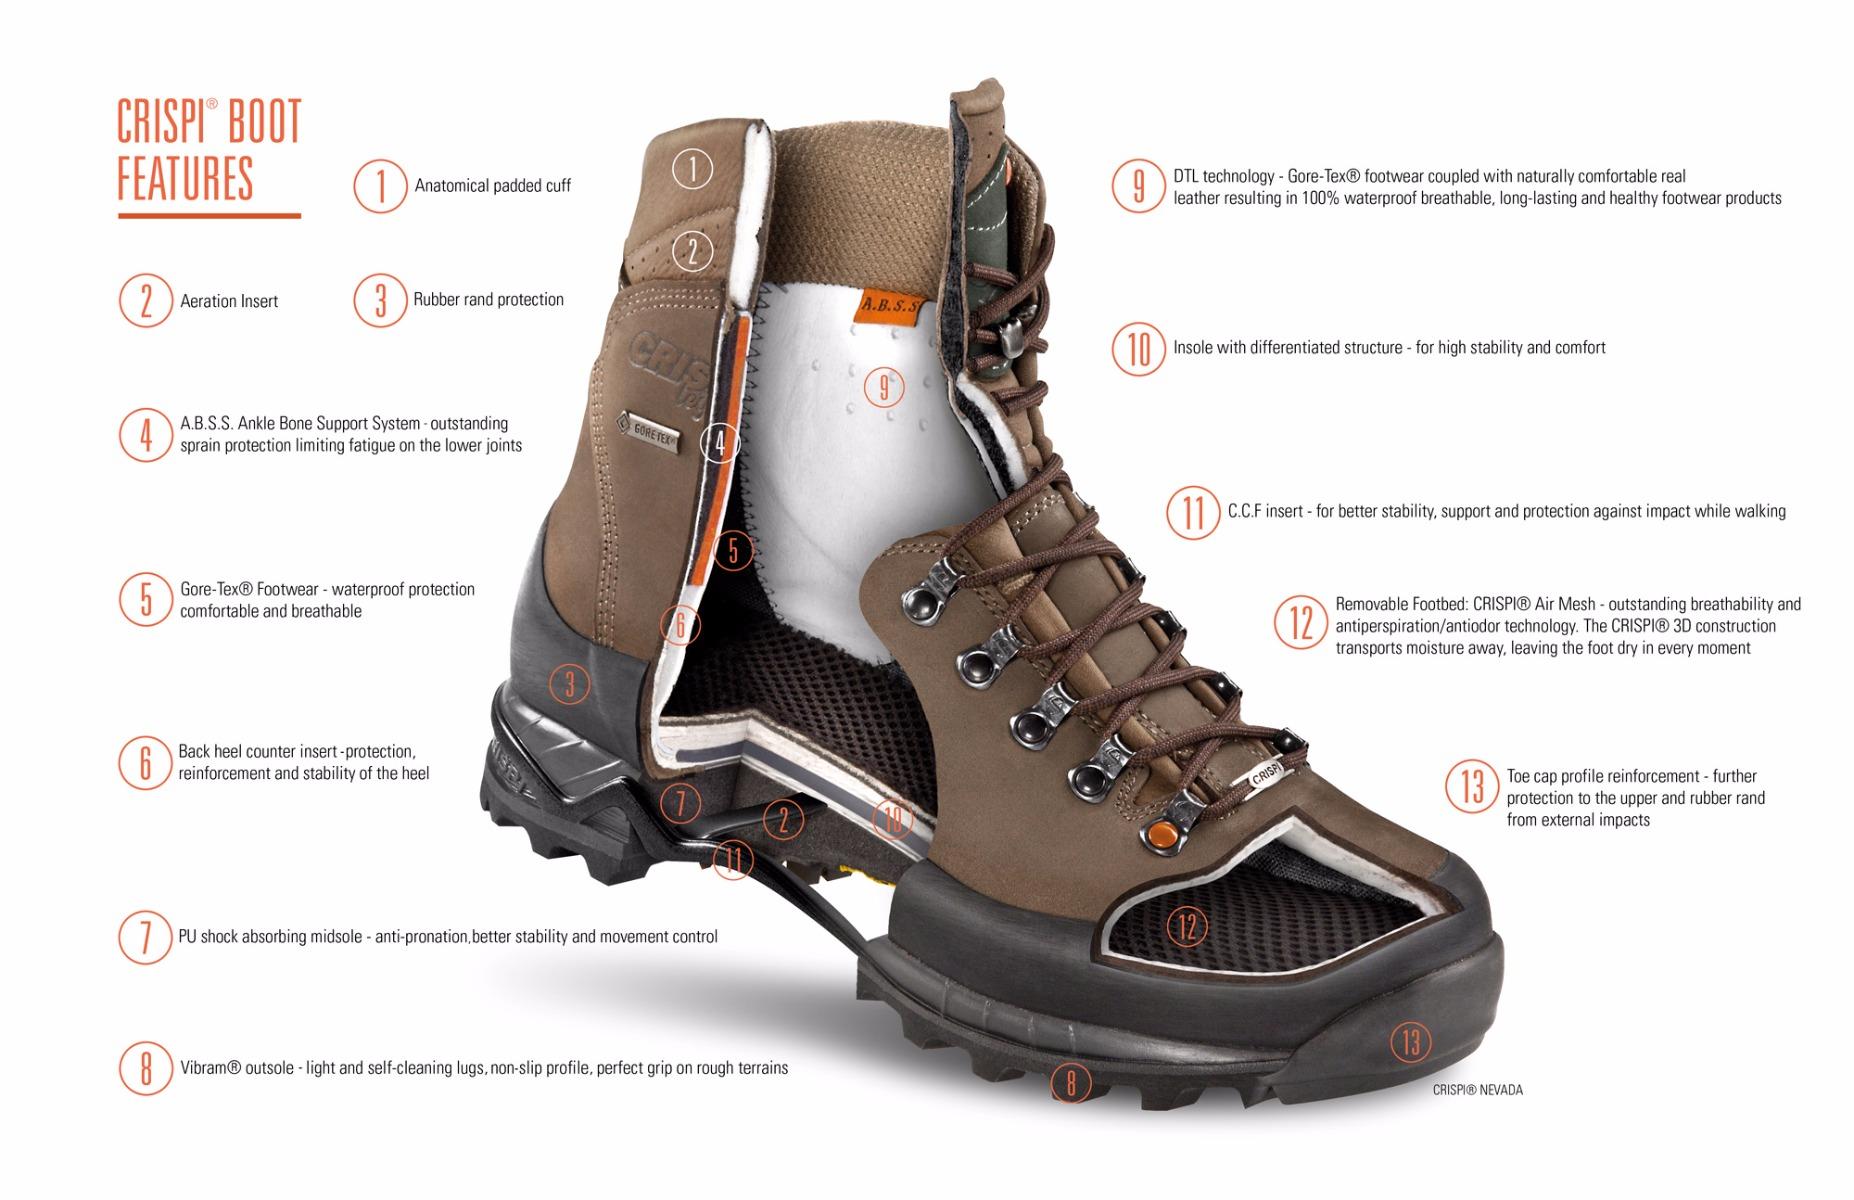 long lasting hiking boots